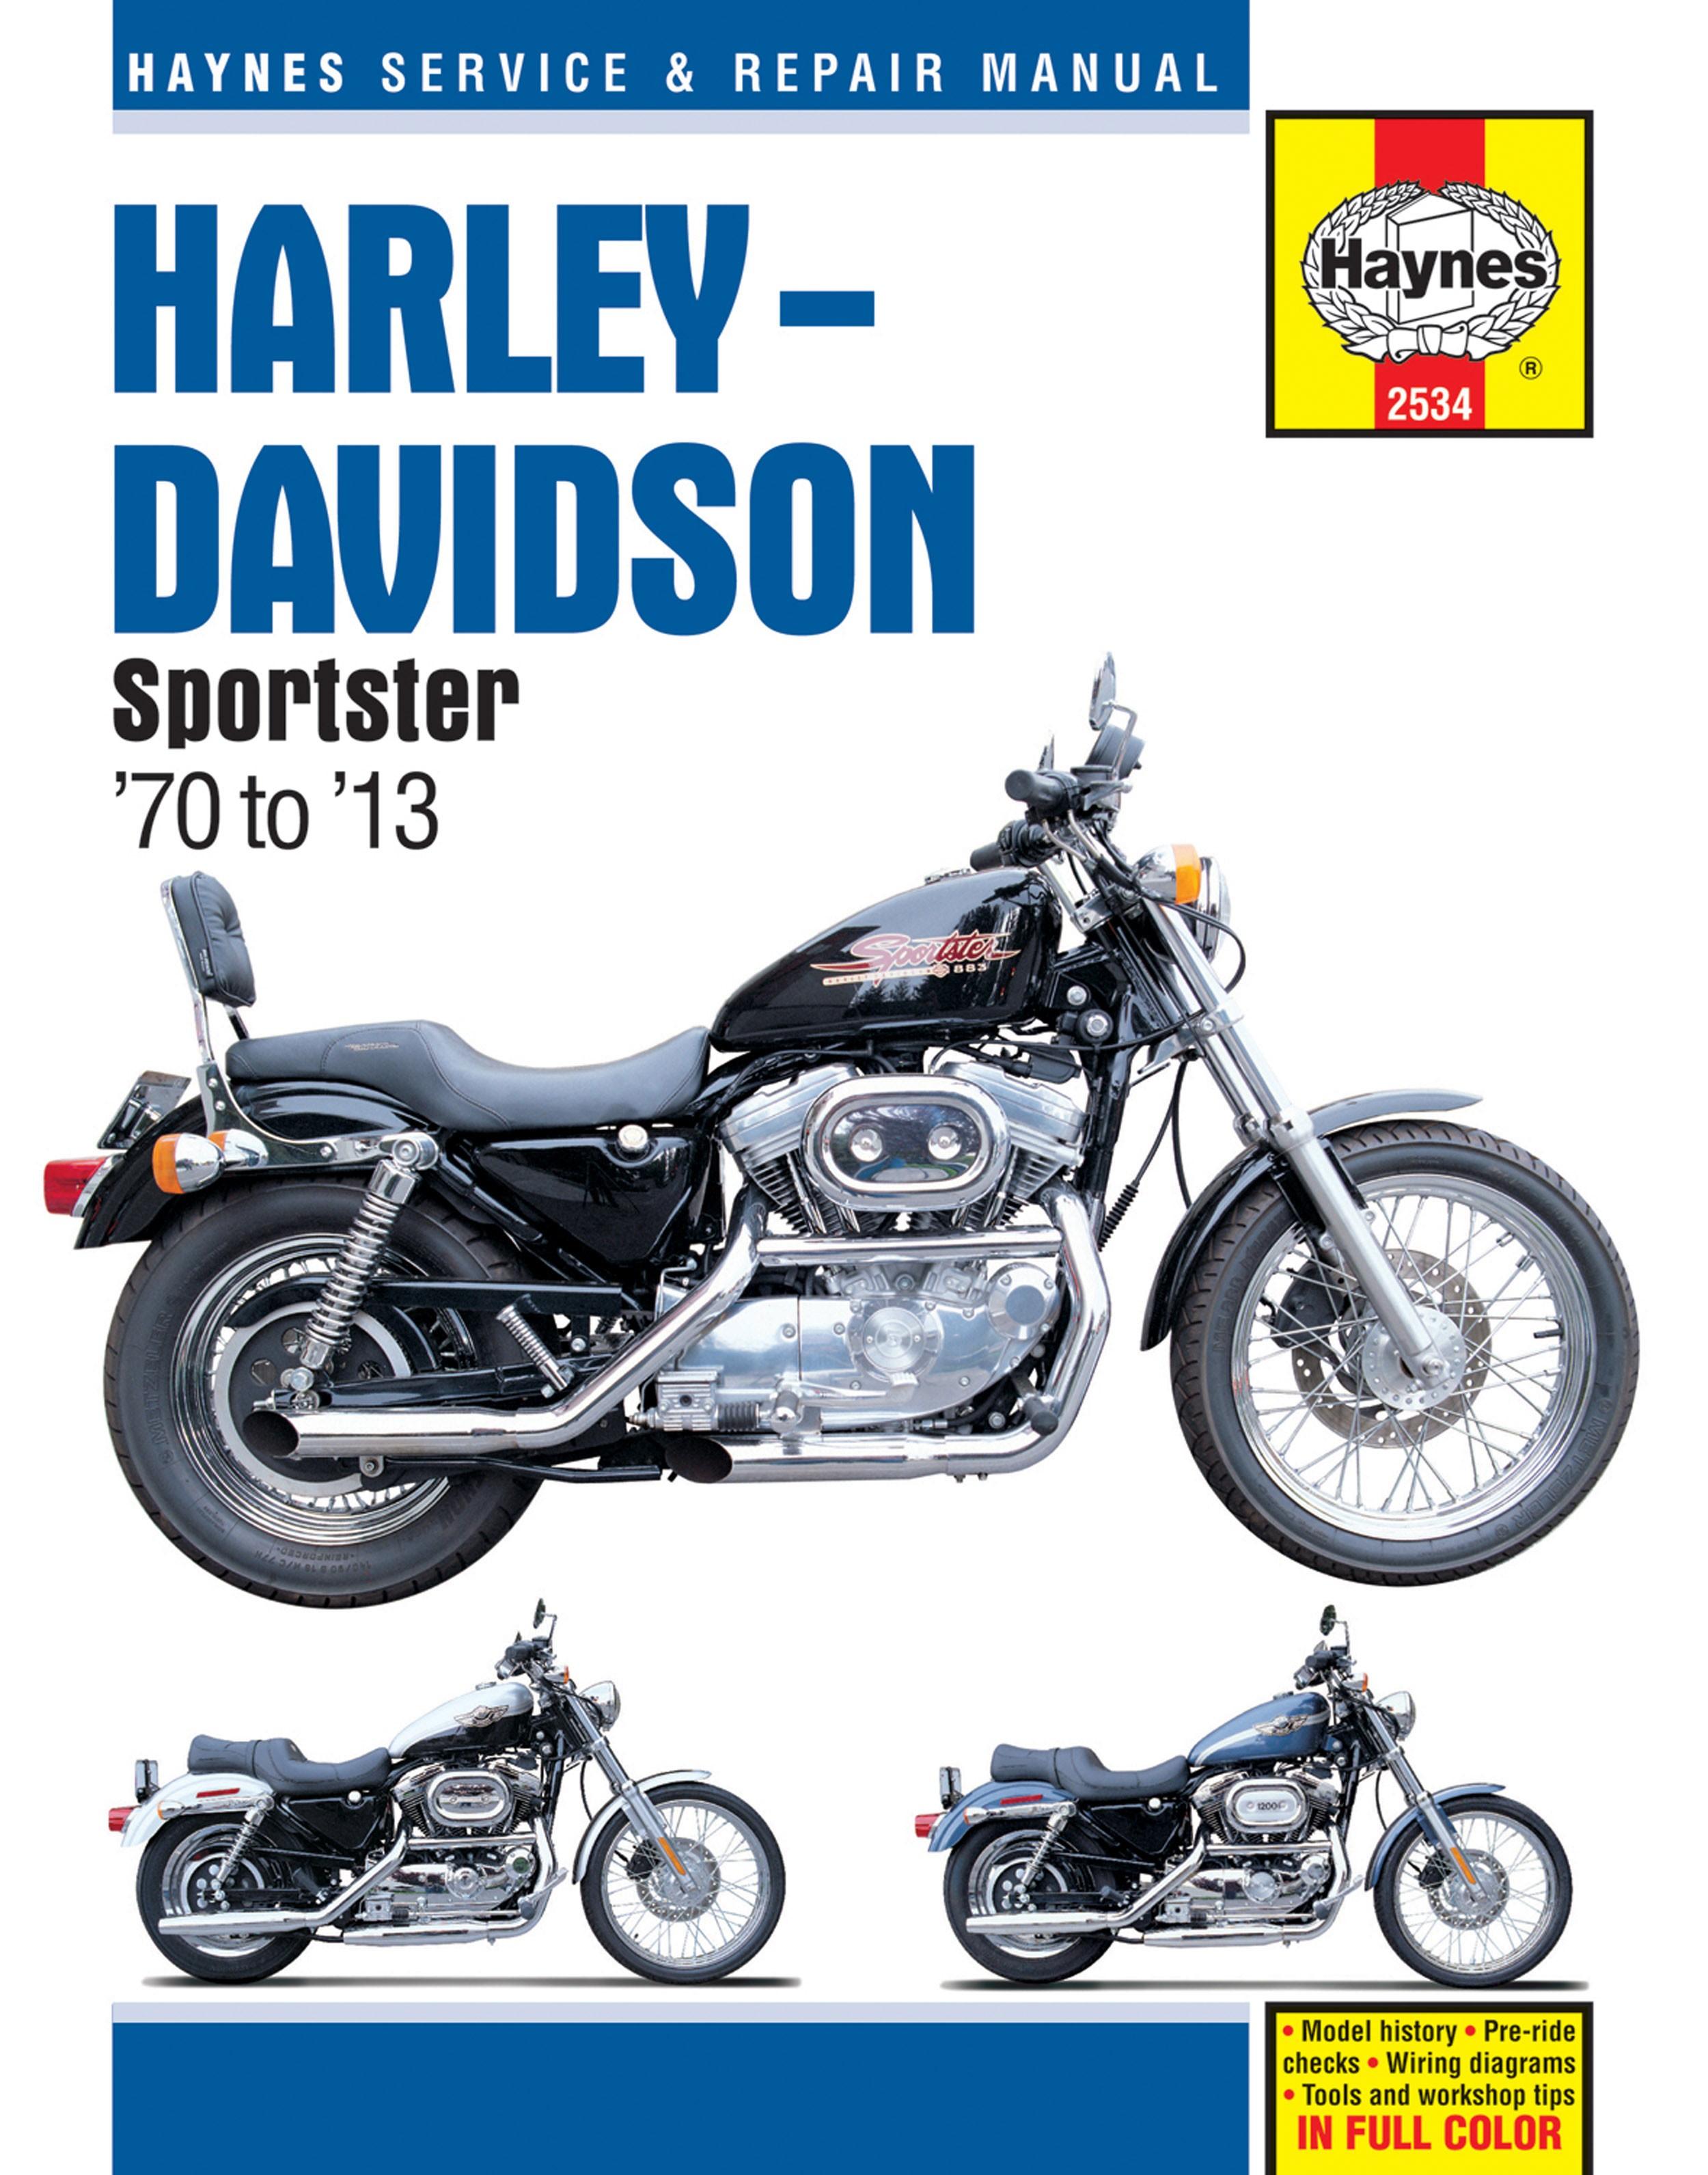 HAYNES Repair Manual - Harley-Davidson Sportster XL, XLH, XLCH, XLS, XLX  883/1000/1100/1200 ...